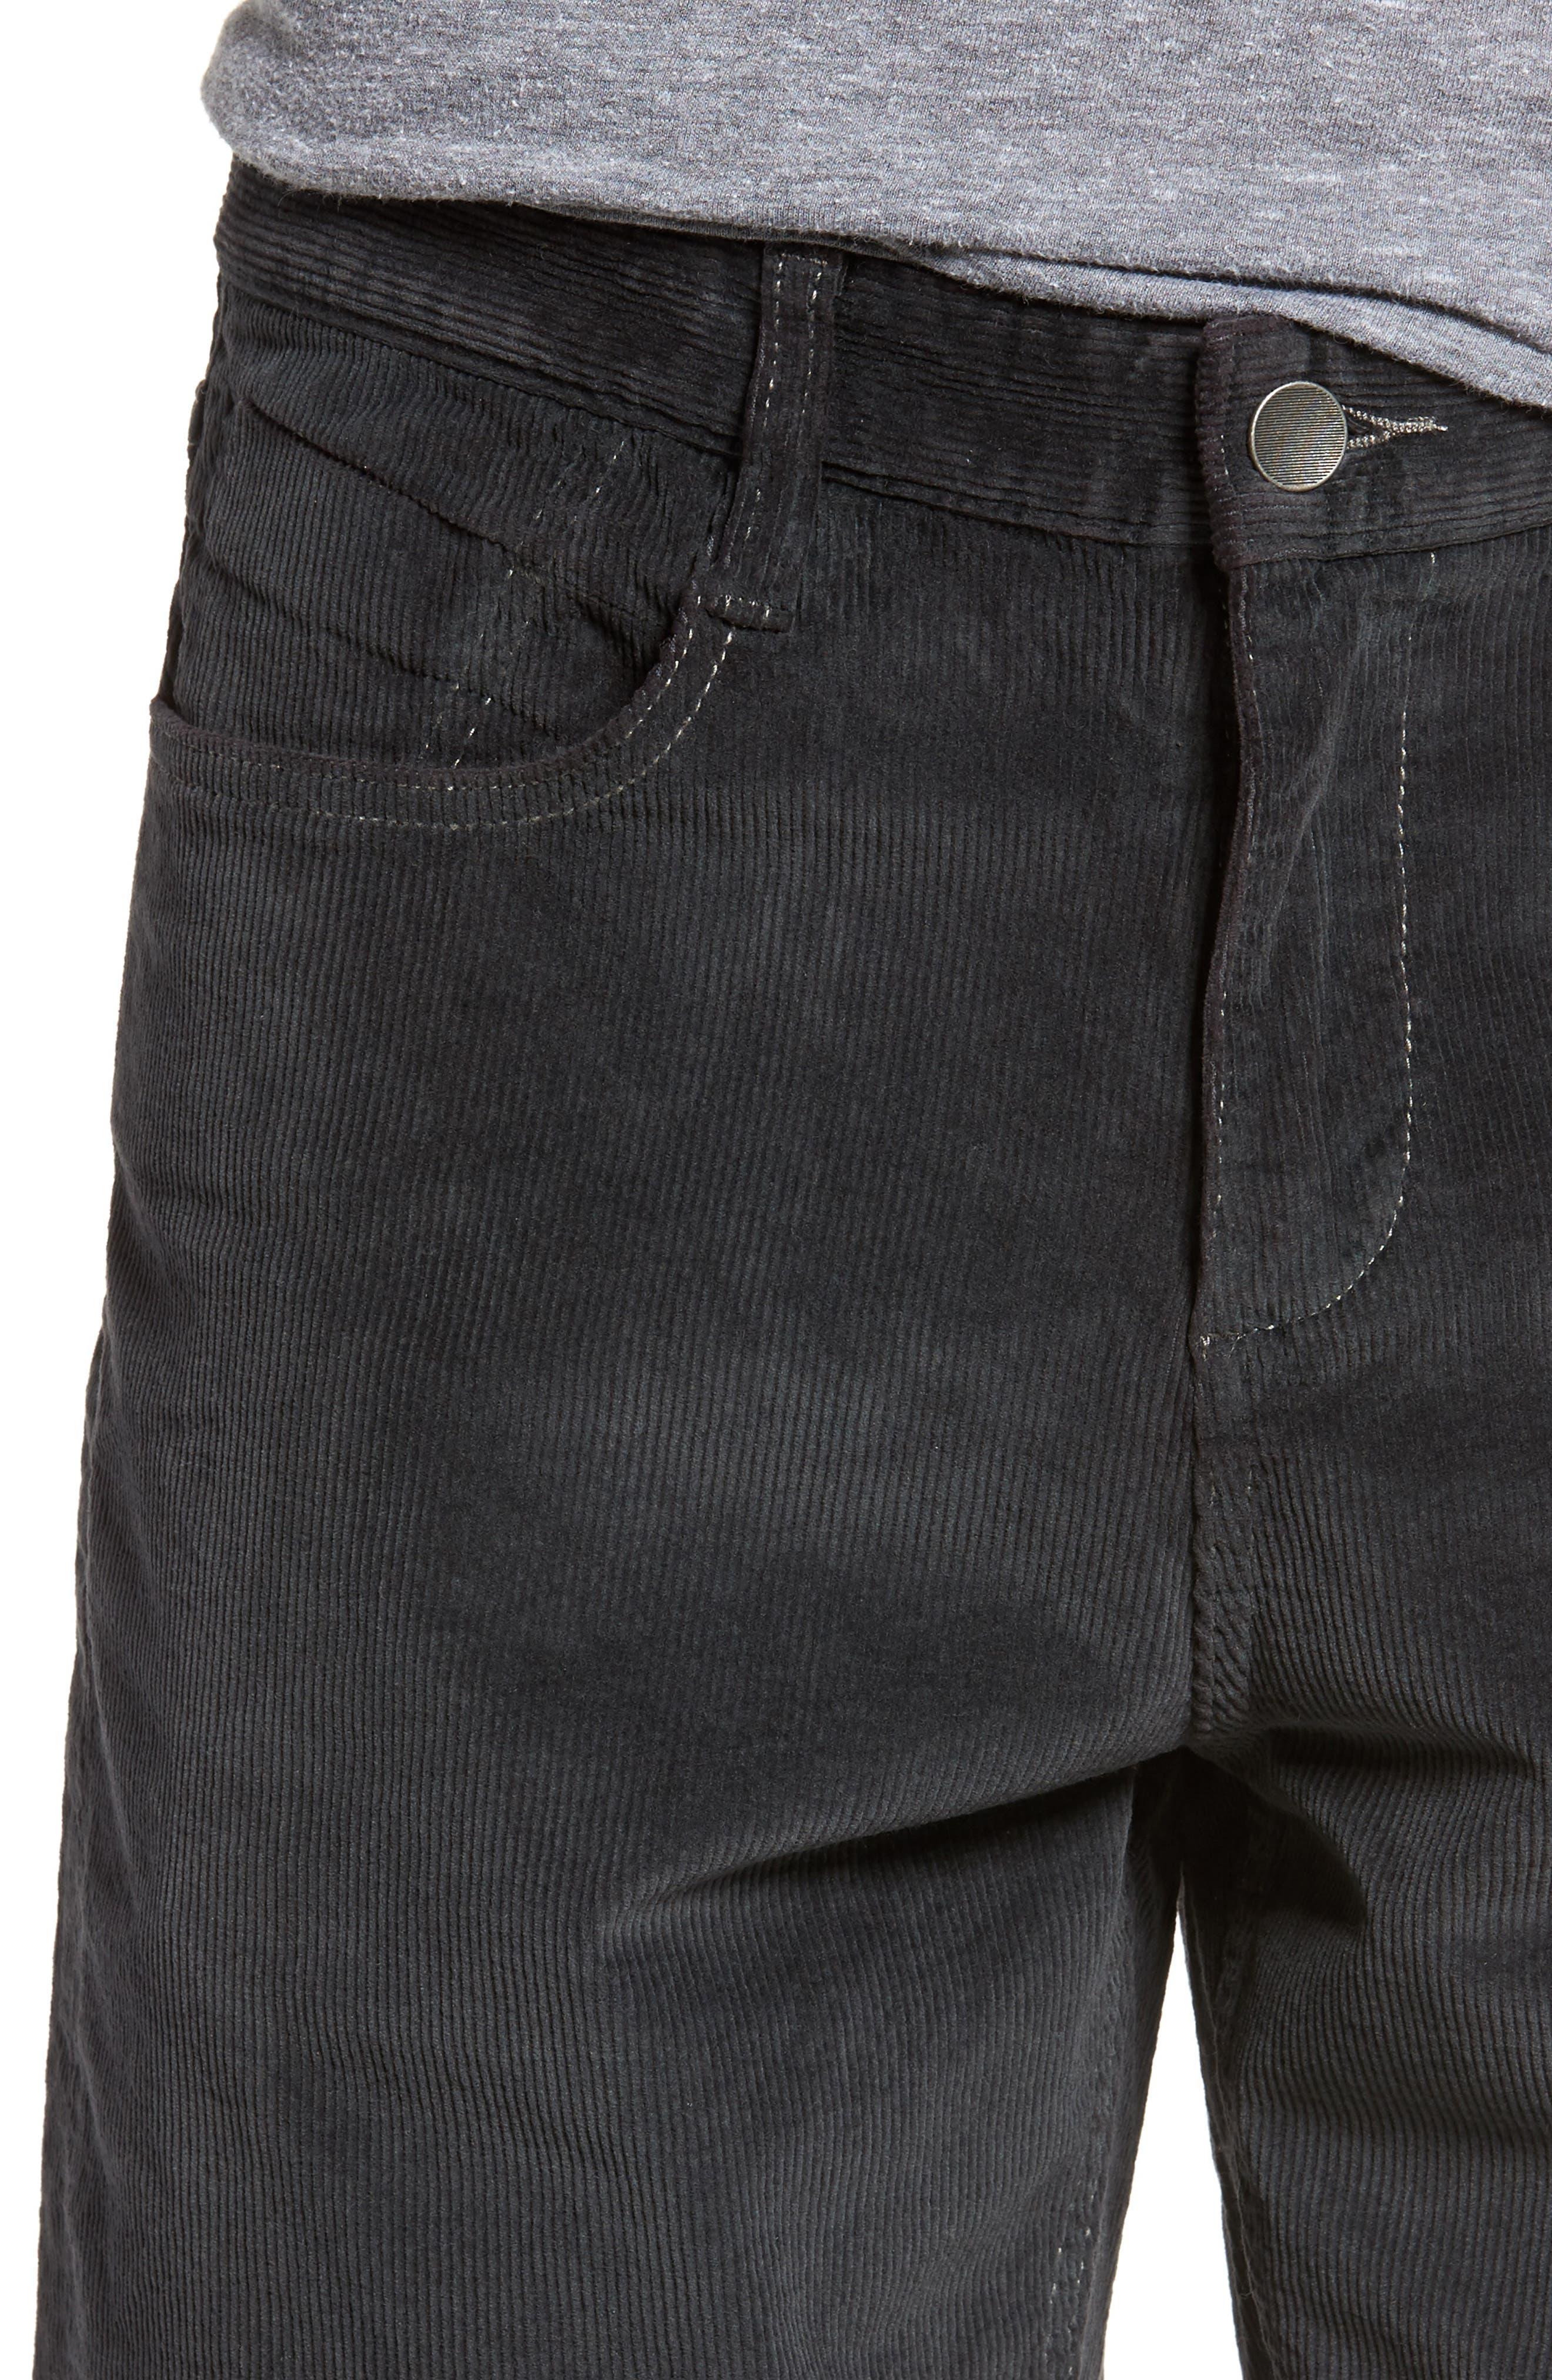 Outsider Corduroy Shorts,                             Alternate thumbnail 4, color,                             010